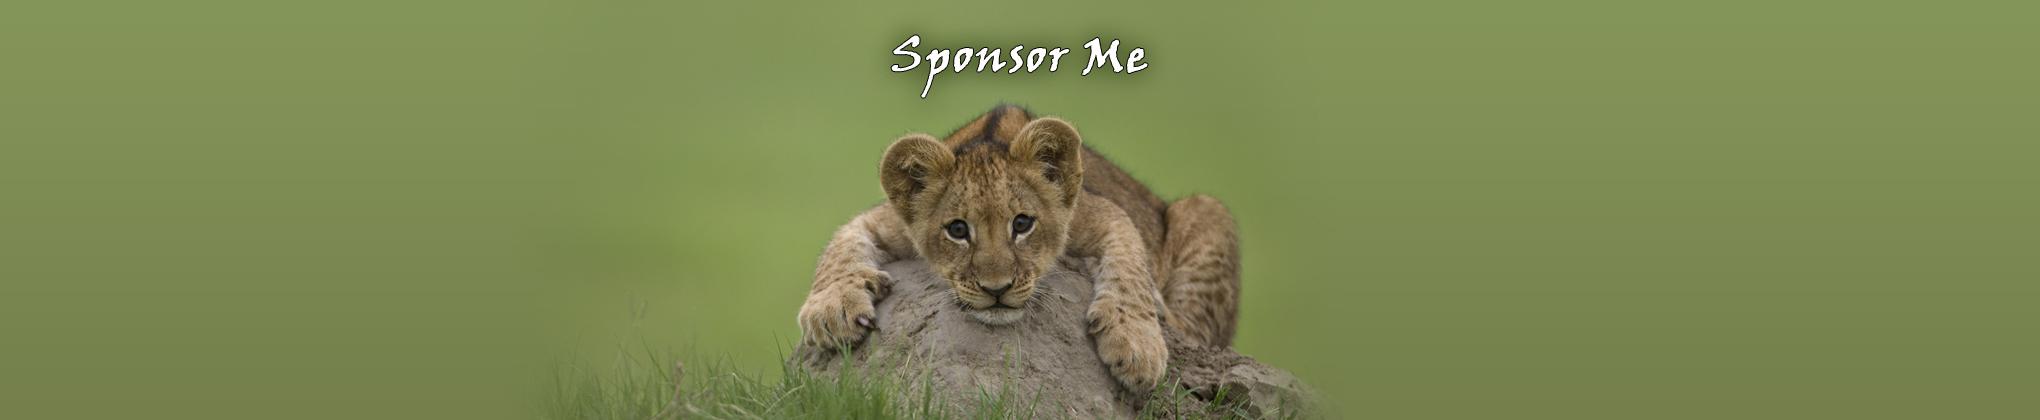 Sponsor Me Lion